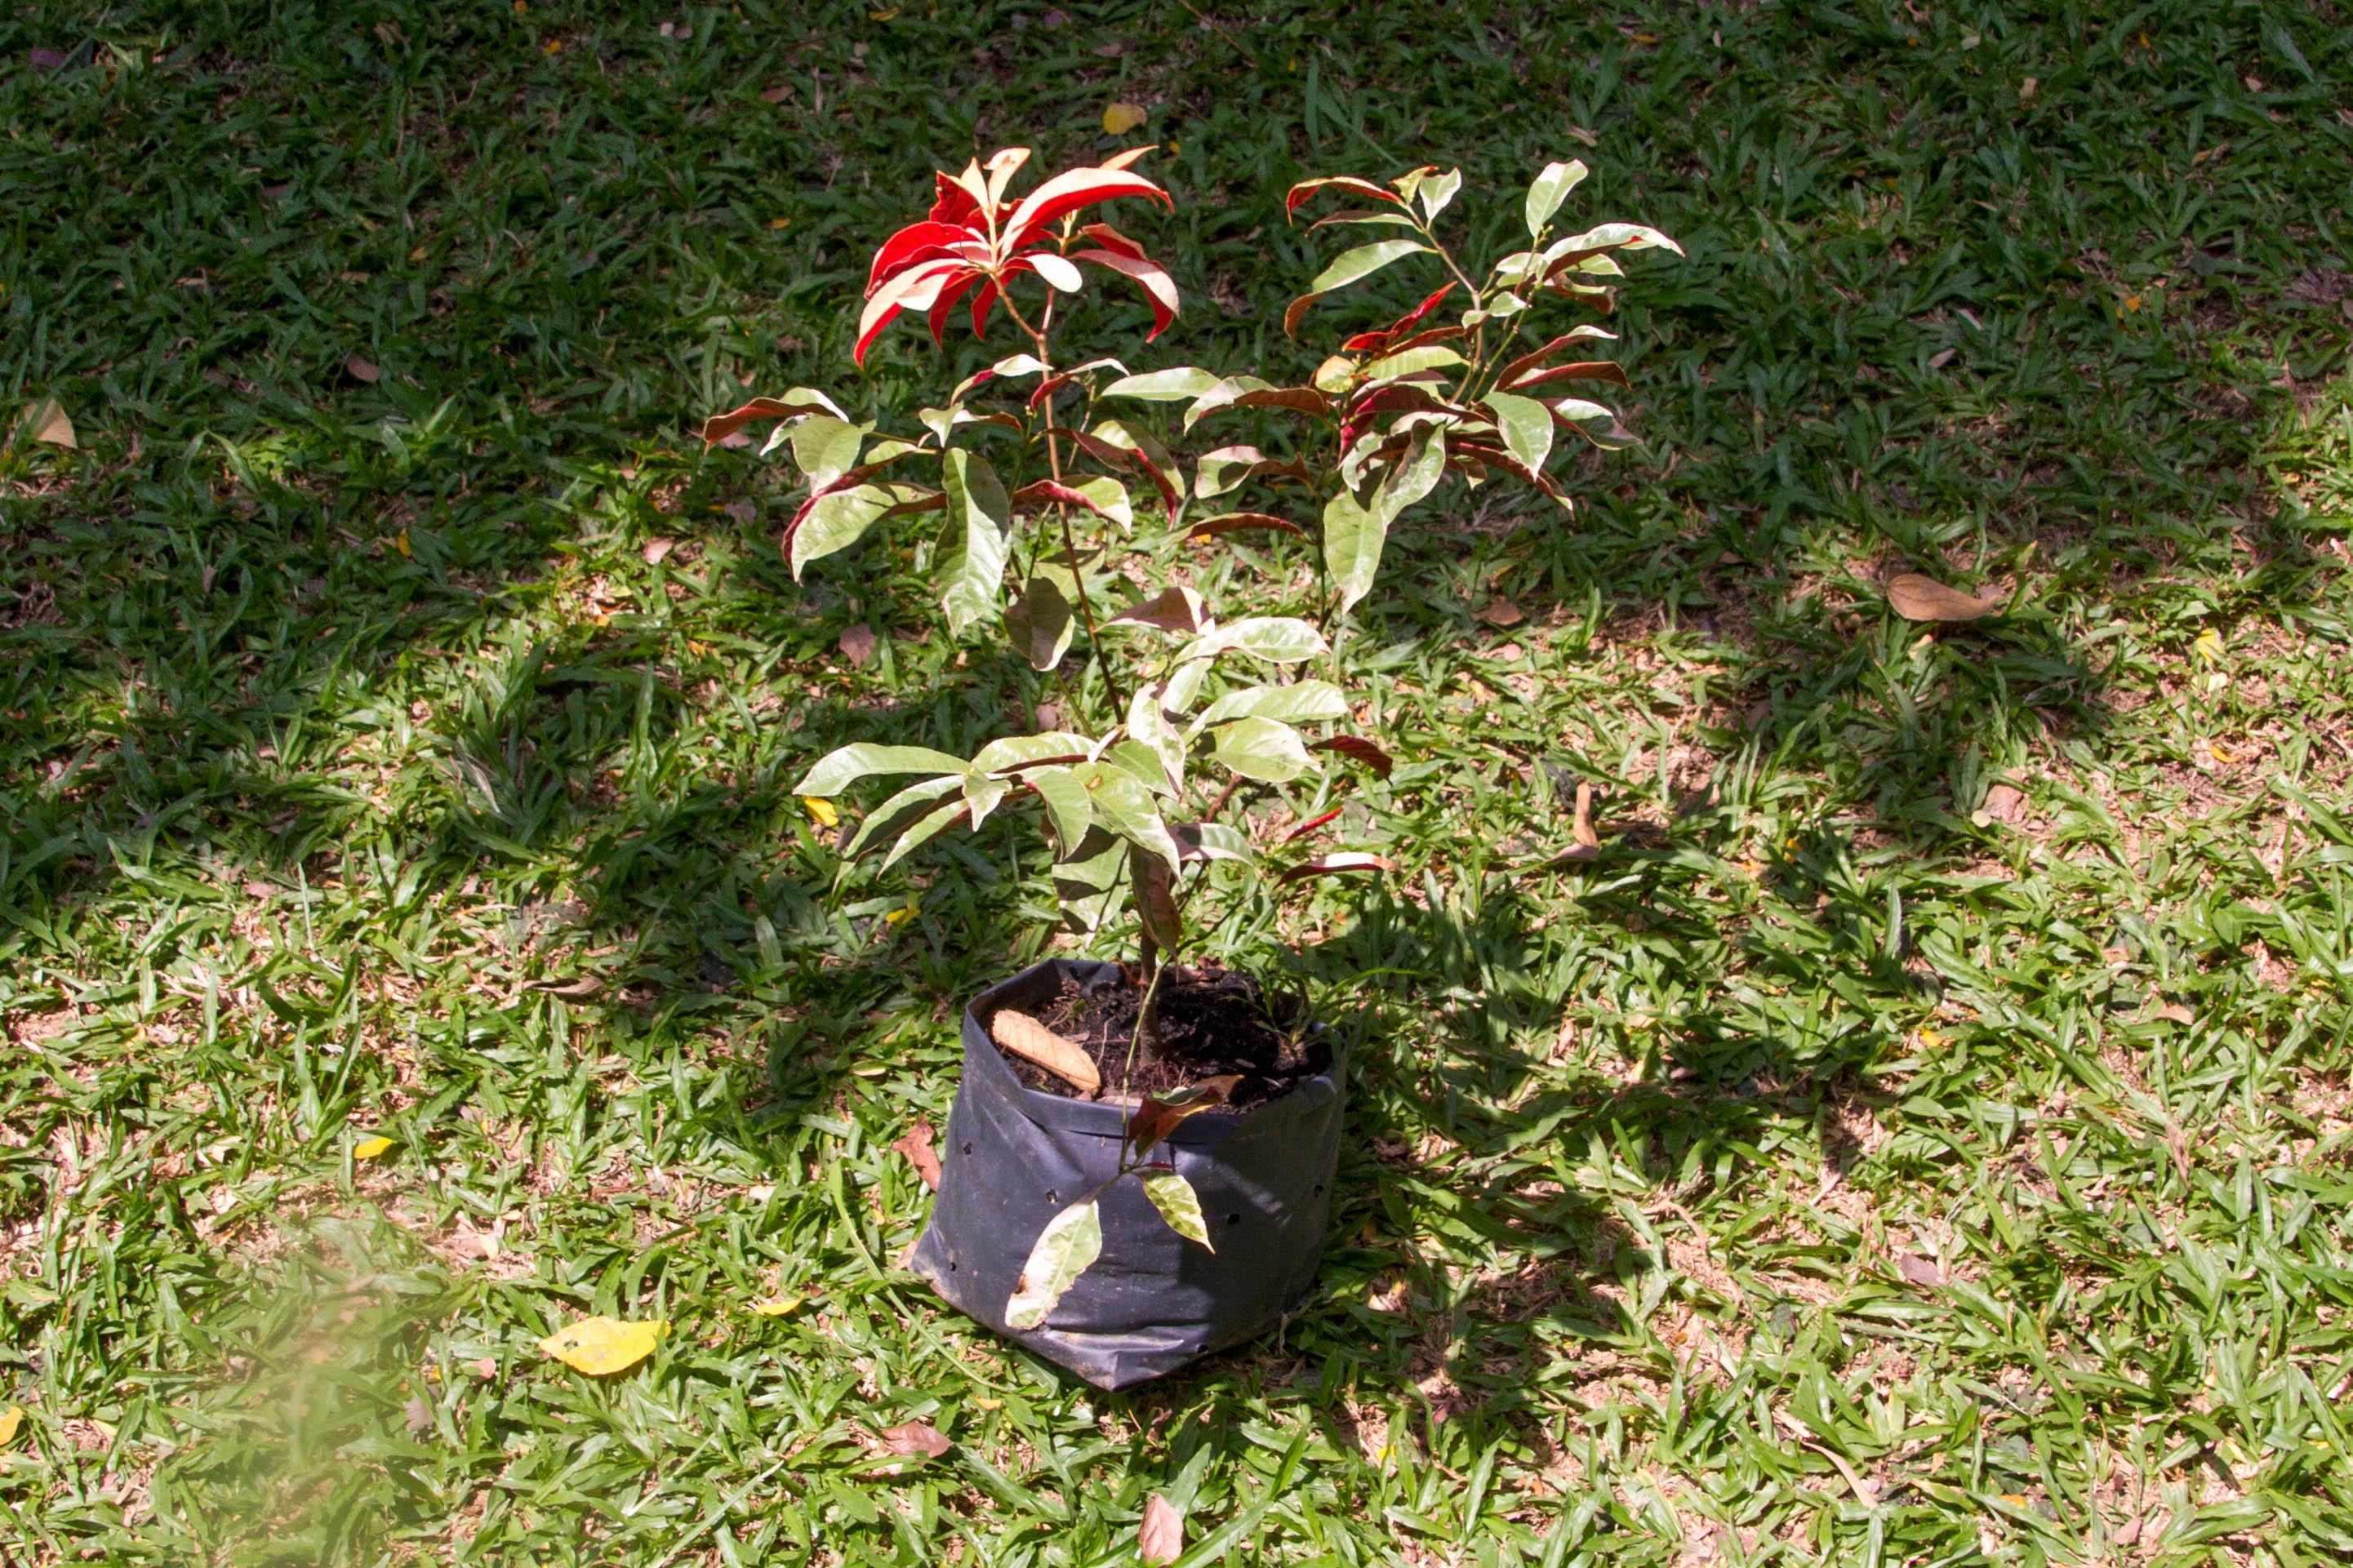 Excoecaria cochinchinensis Lour., Chinese croton, กระบือเจ็ดตัว